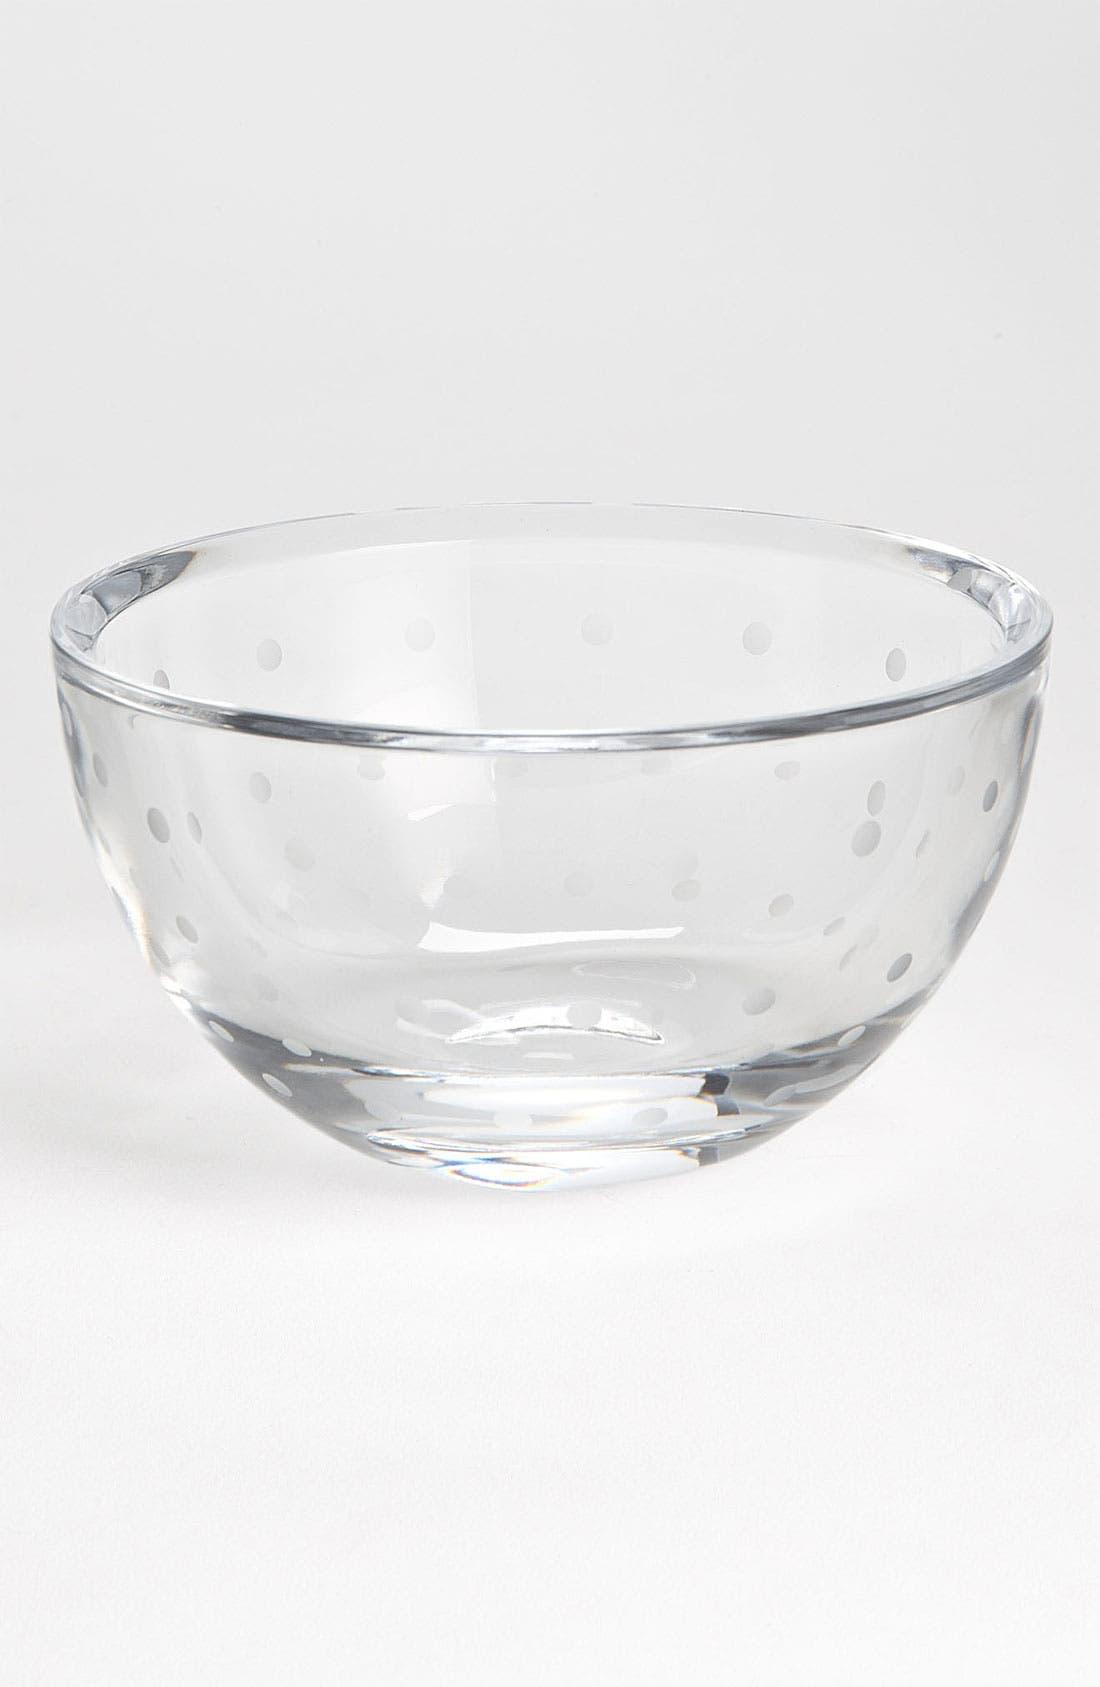 Alternate Image 1 Selected - kate spade new york 'larabee dot' round bowl